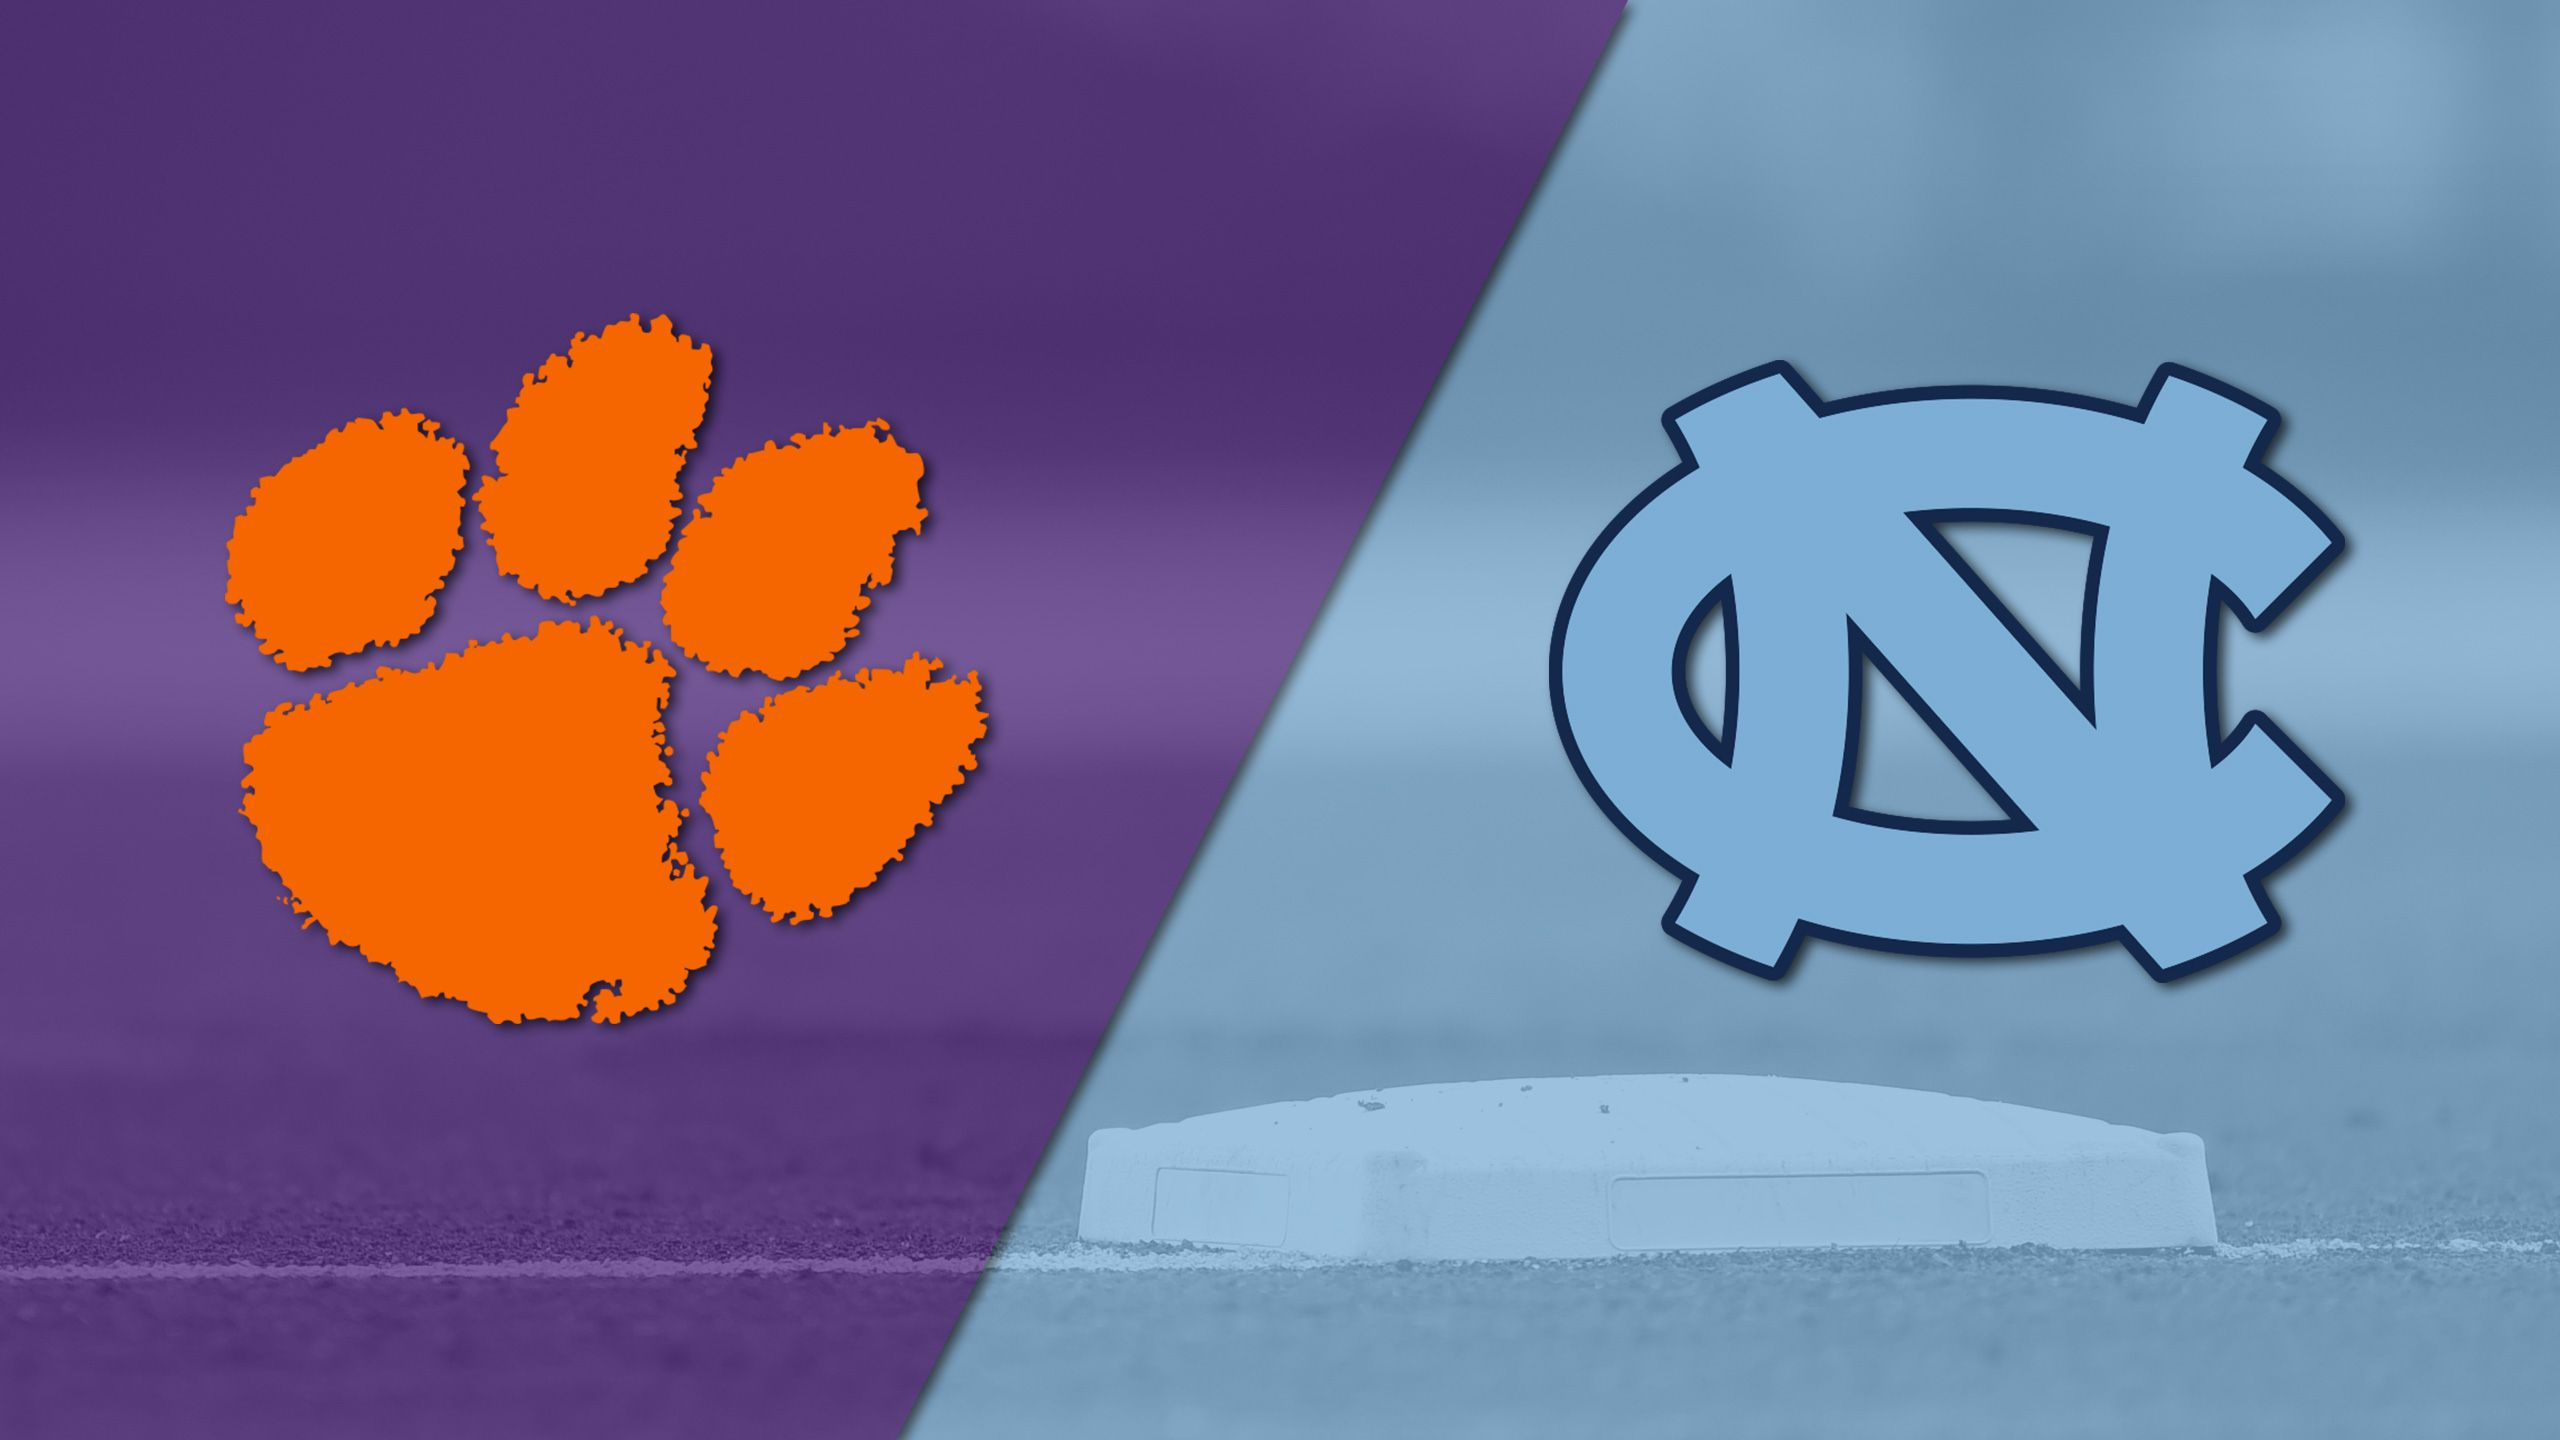 #3 Clemson vs. #4 North Carolina (Baseball)